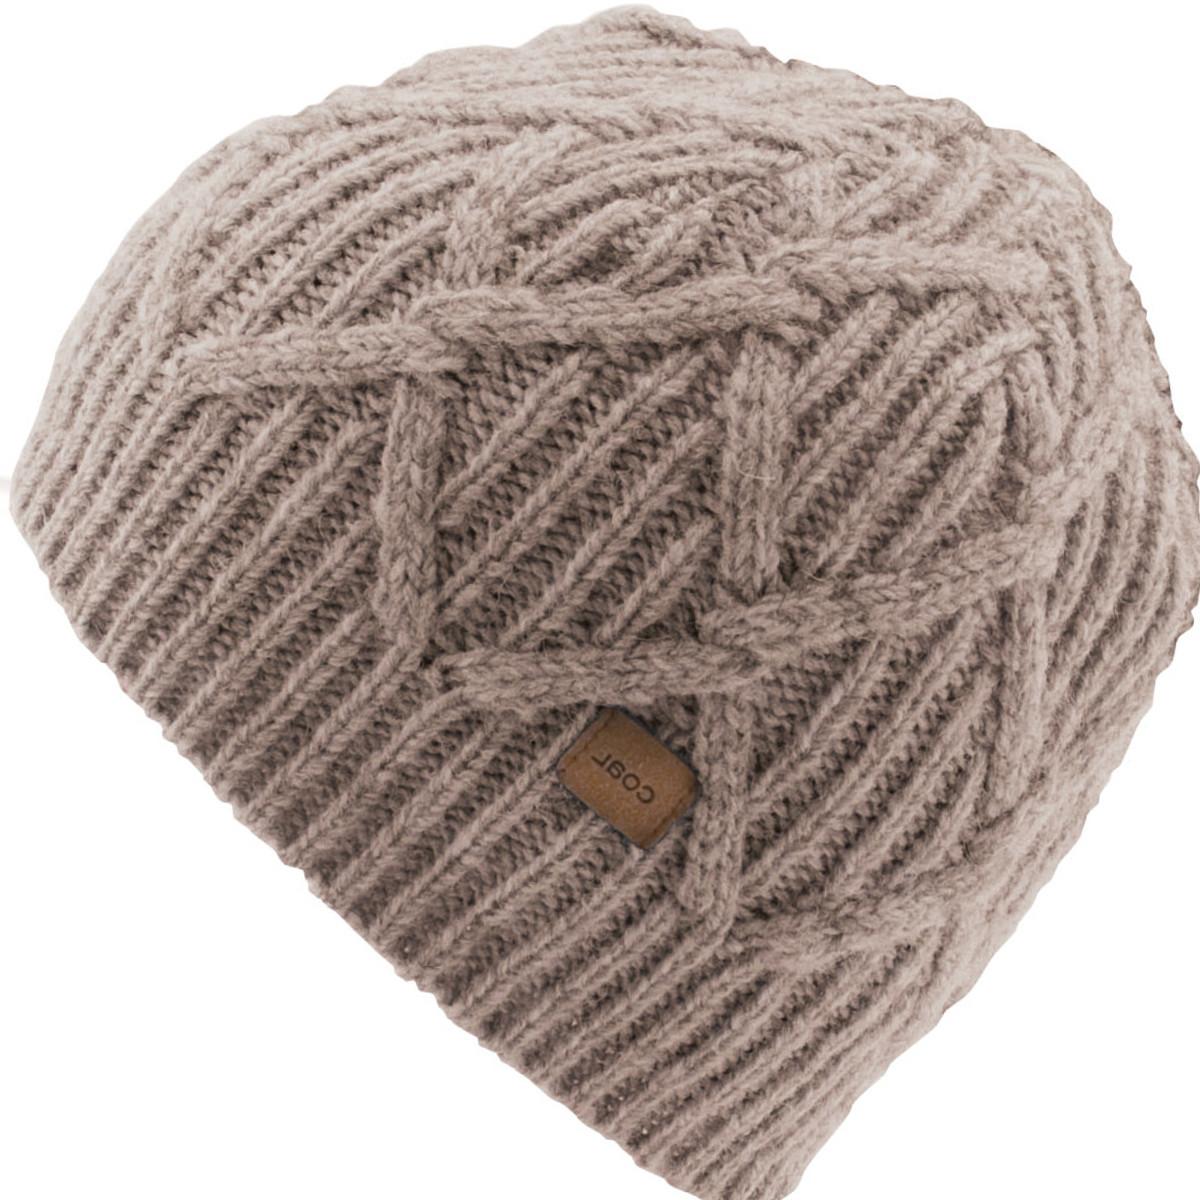 Coal Headwear Yukon Beanie - Women's